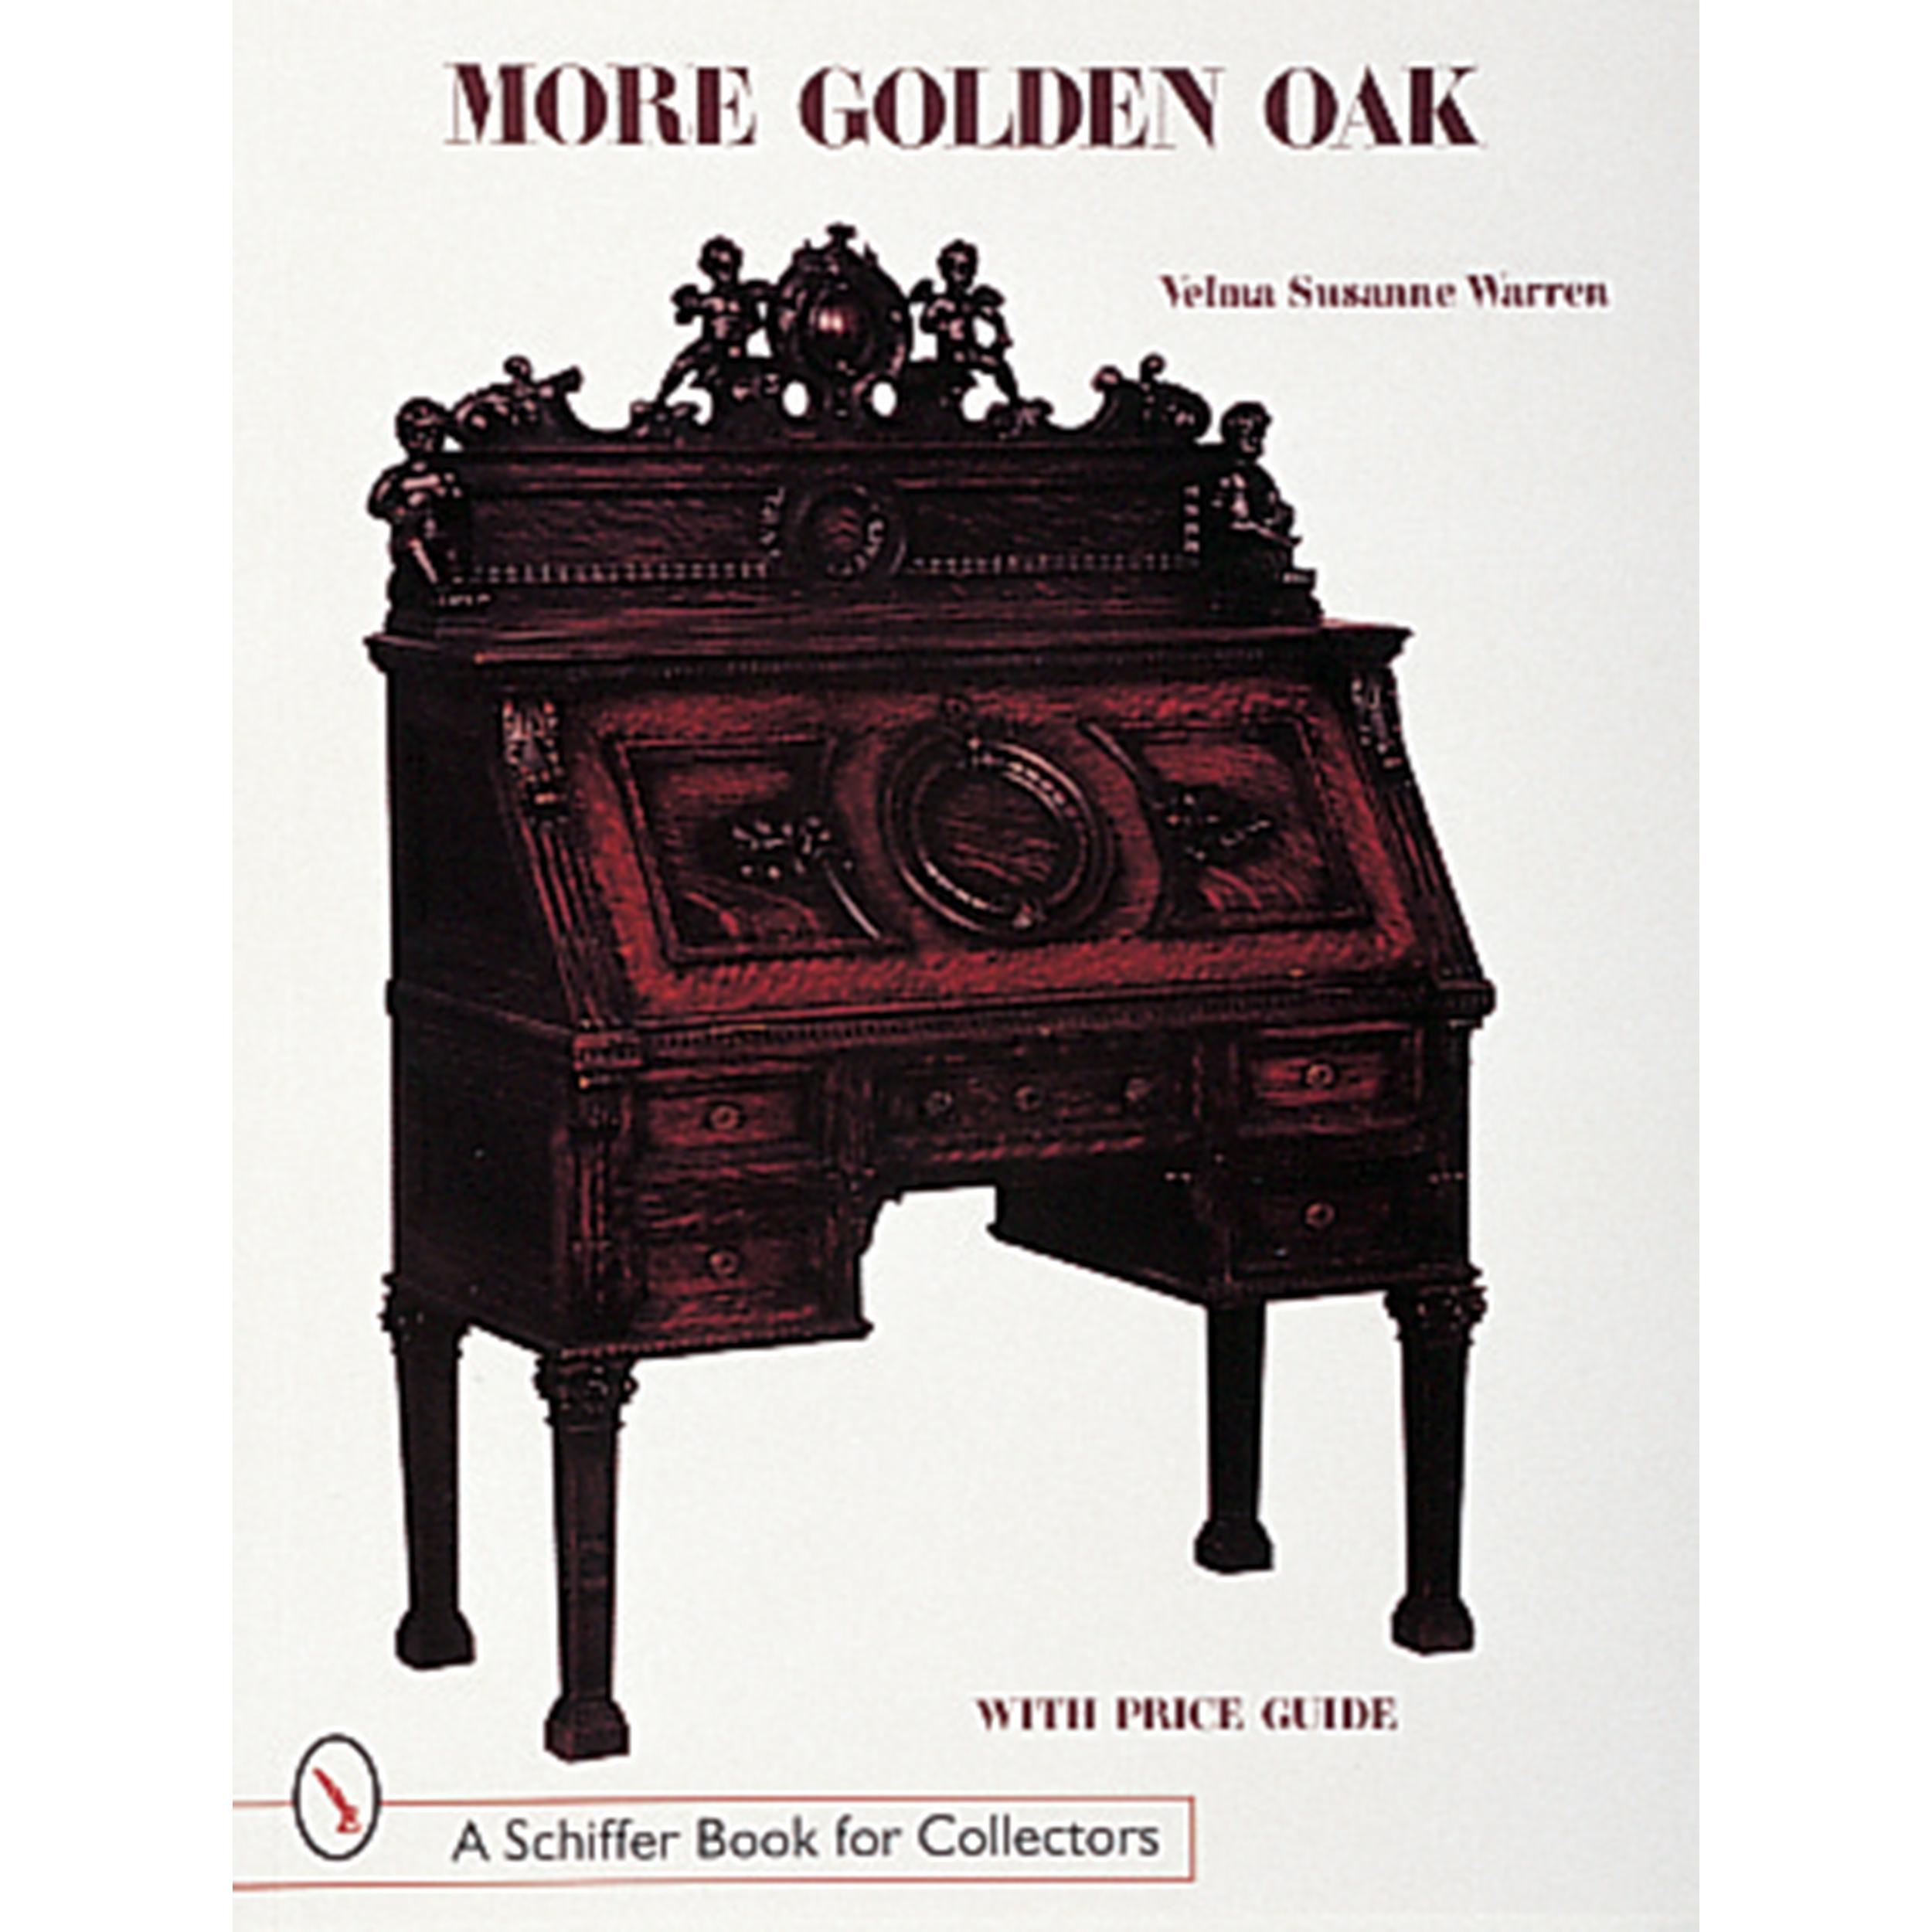 More Golden Oak